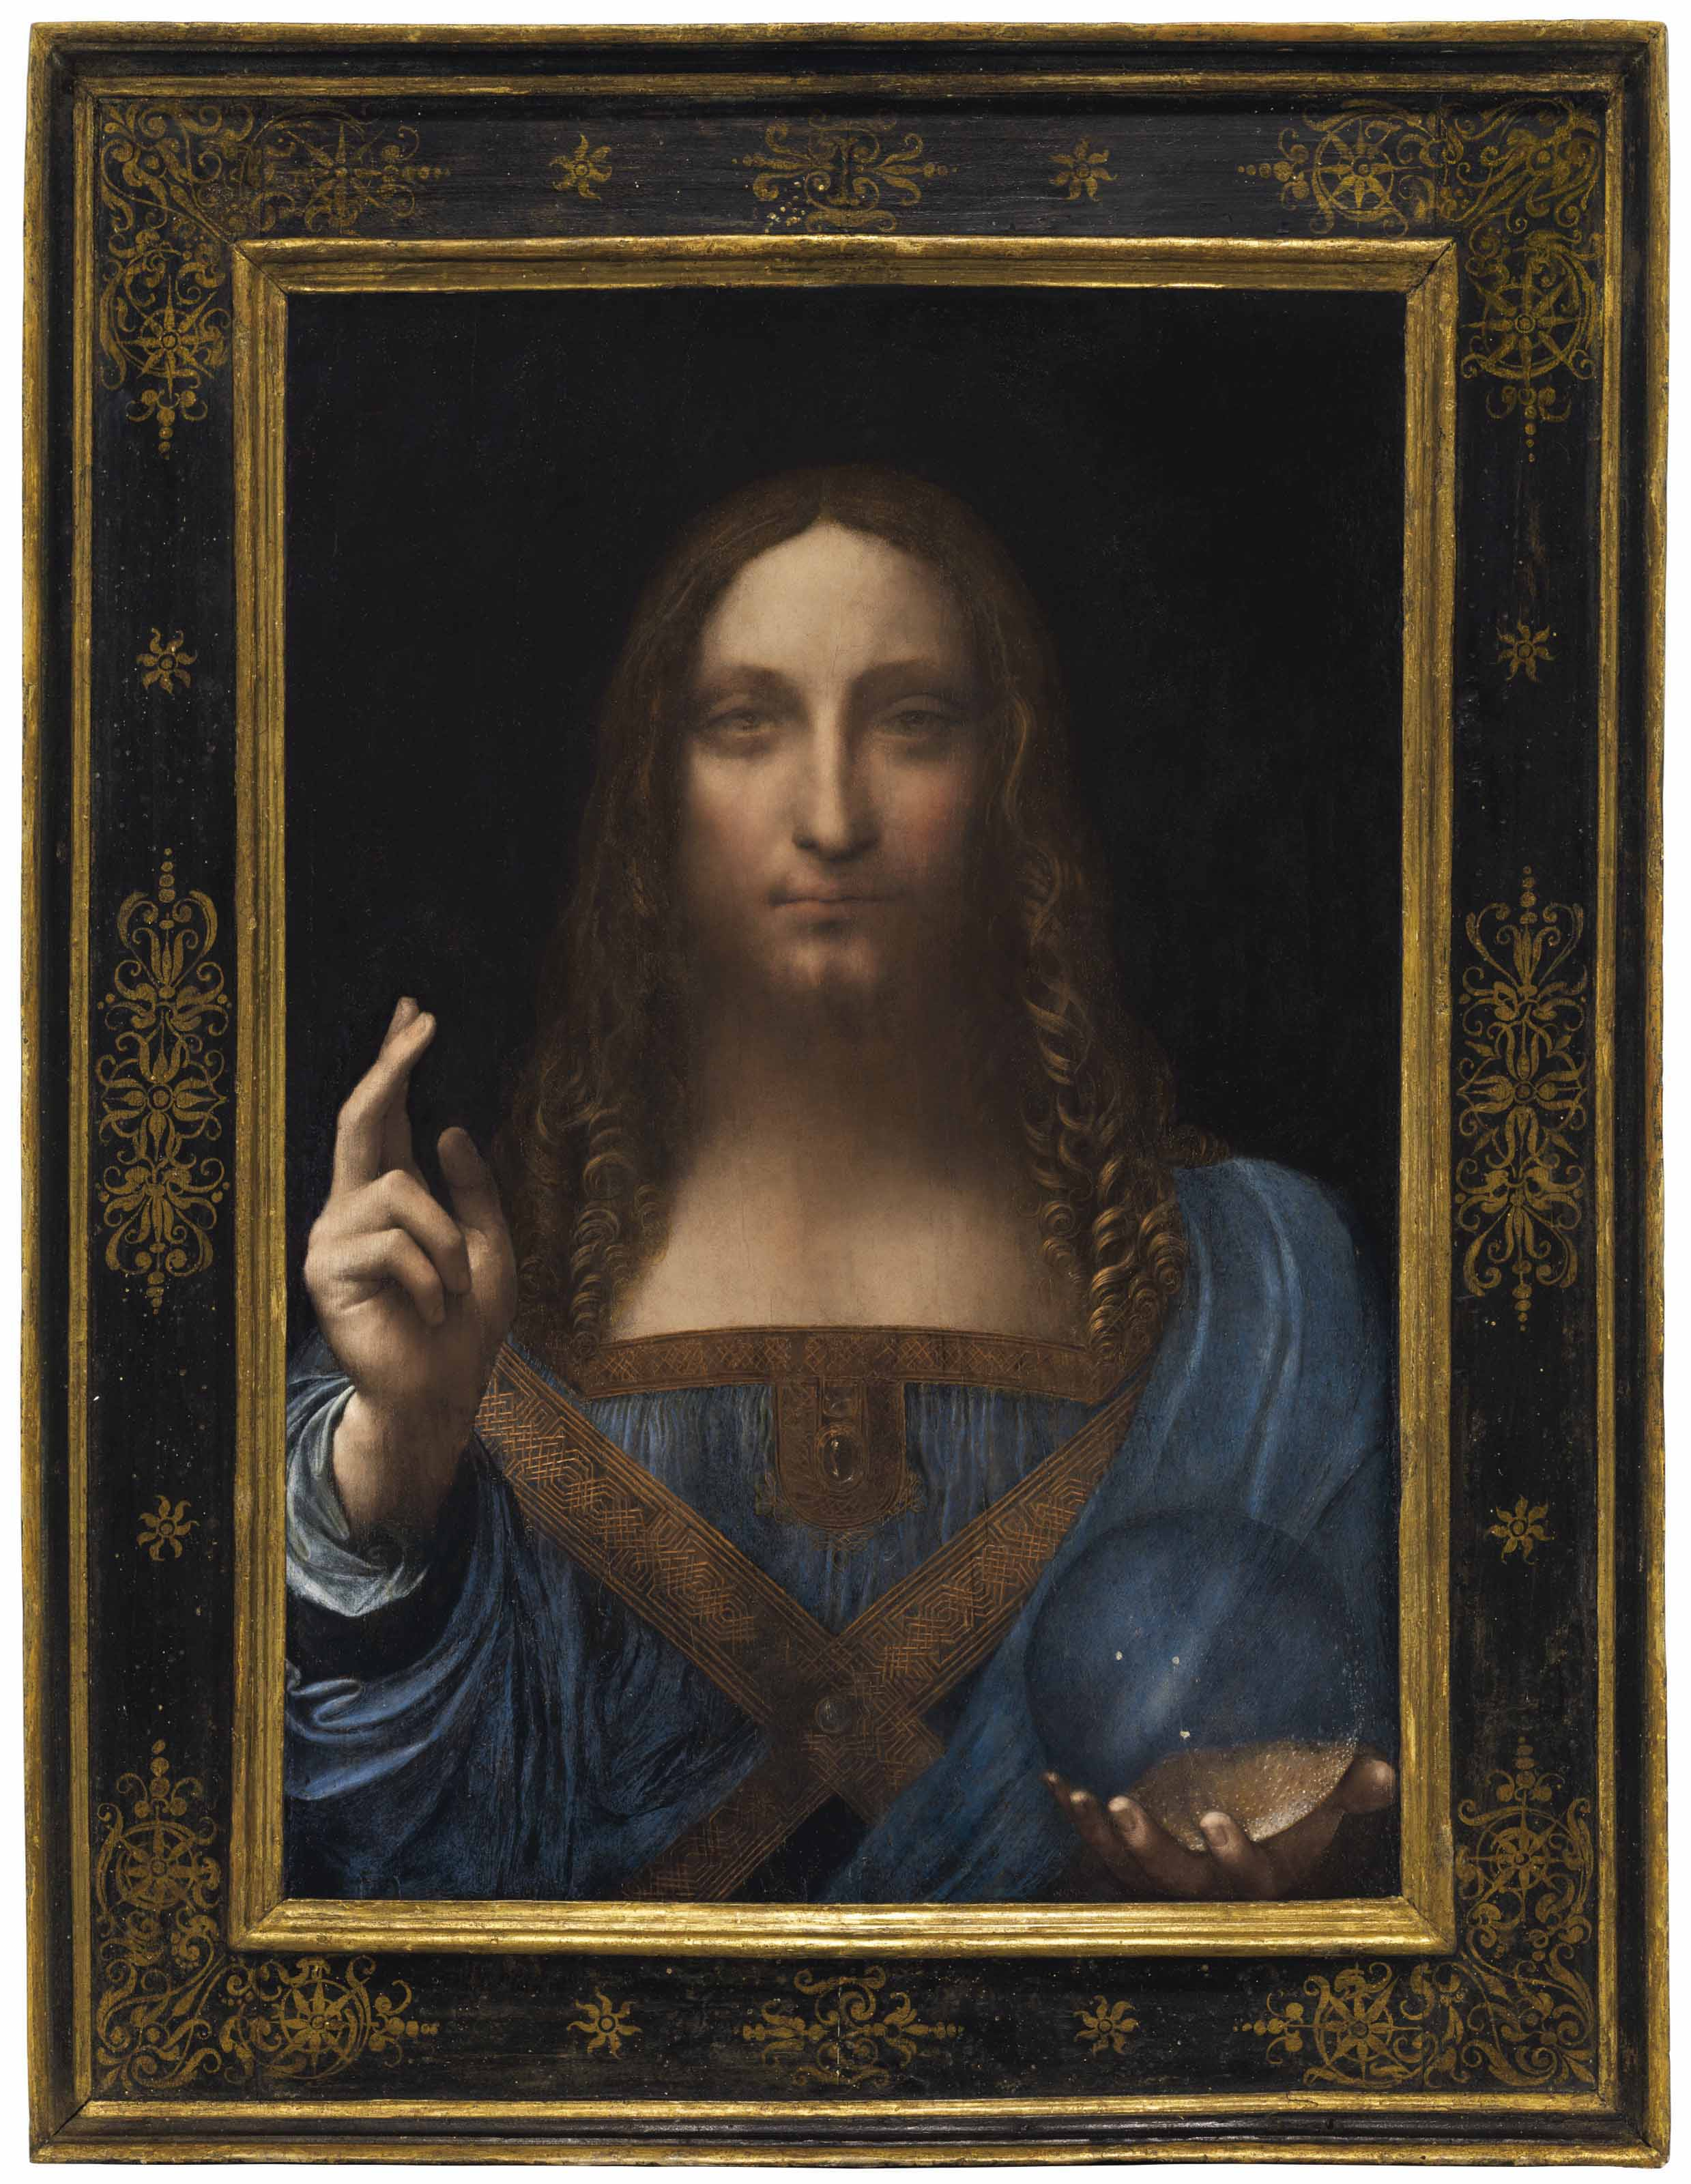 Leonardo DaVinci's painting Salvator Mundi